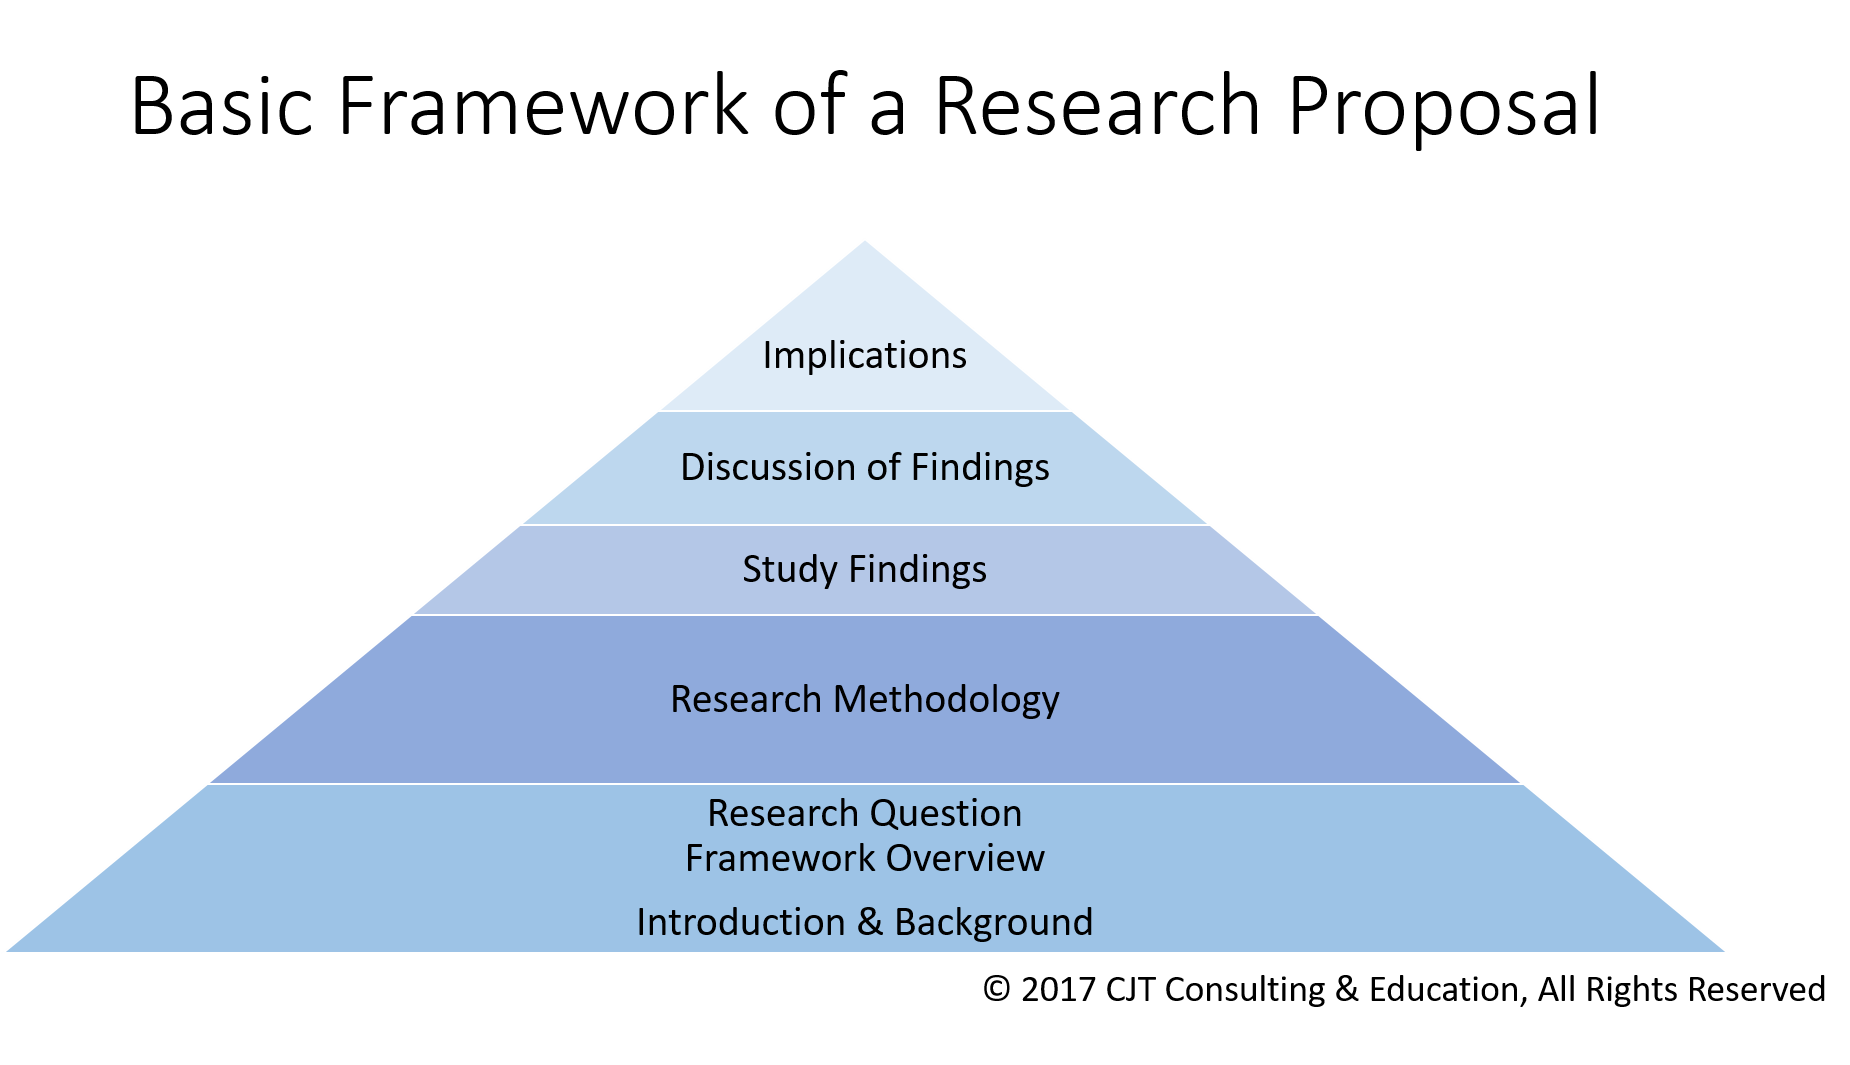 Phd research proposal framework